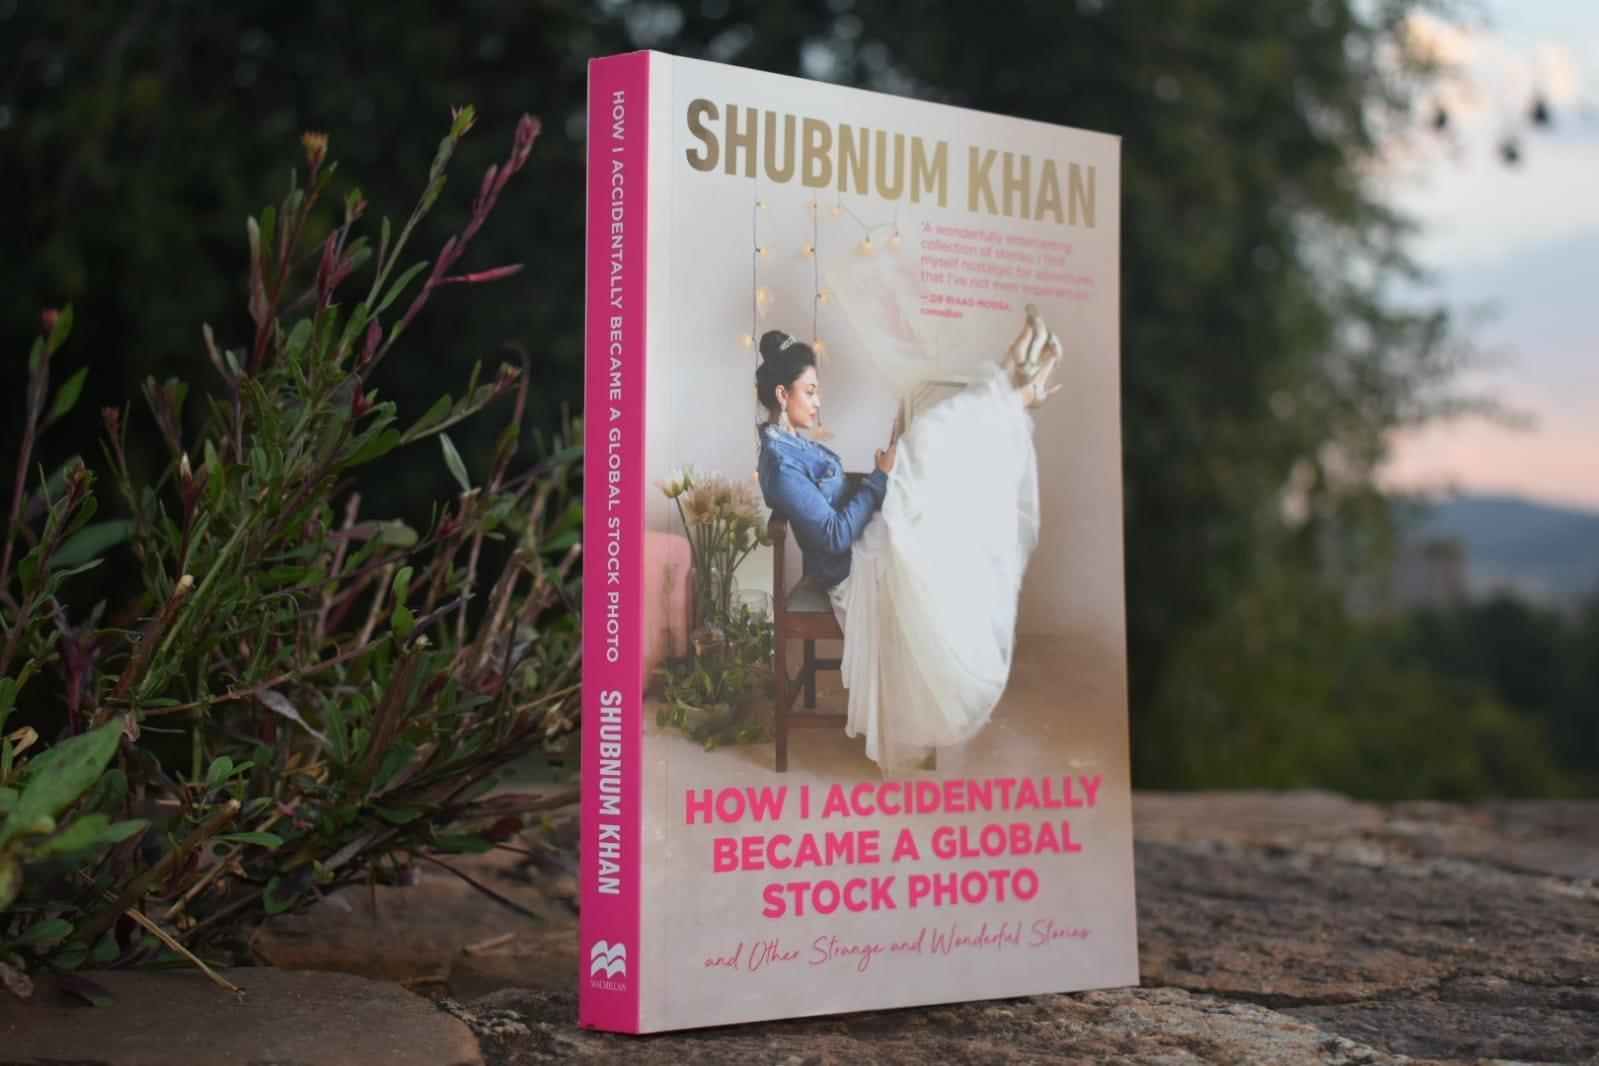 How I Became A Global Stock Photo By Shubnum Khan- Picture Credit: Thabang Malatji.